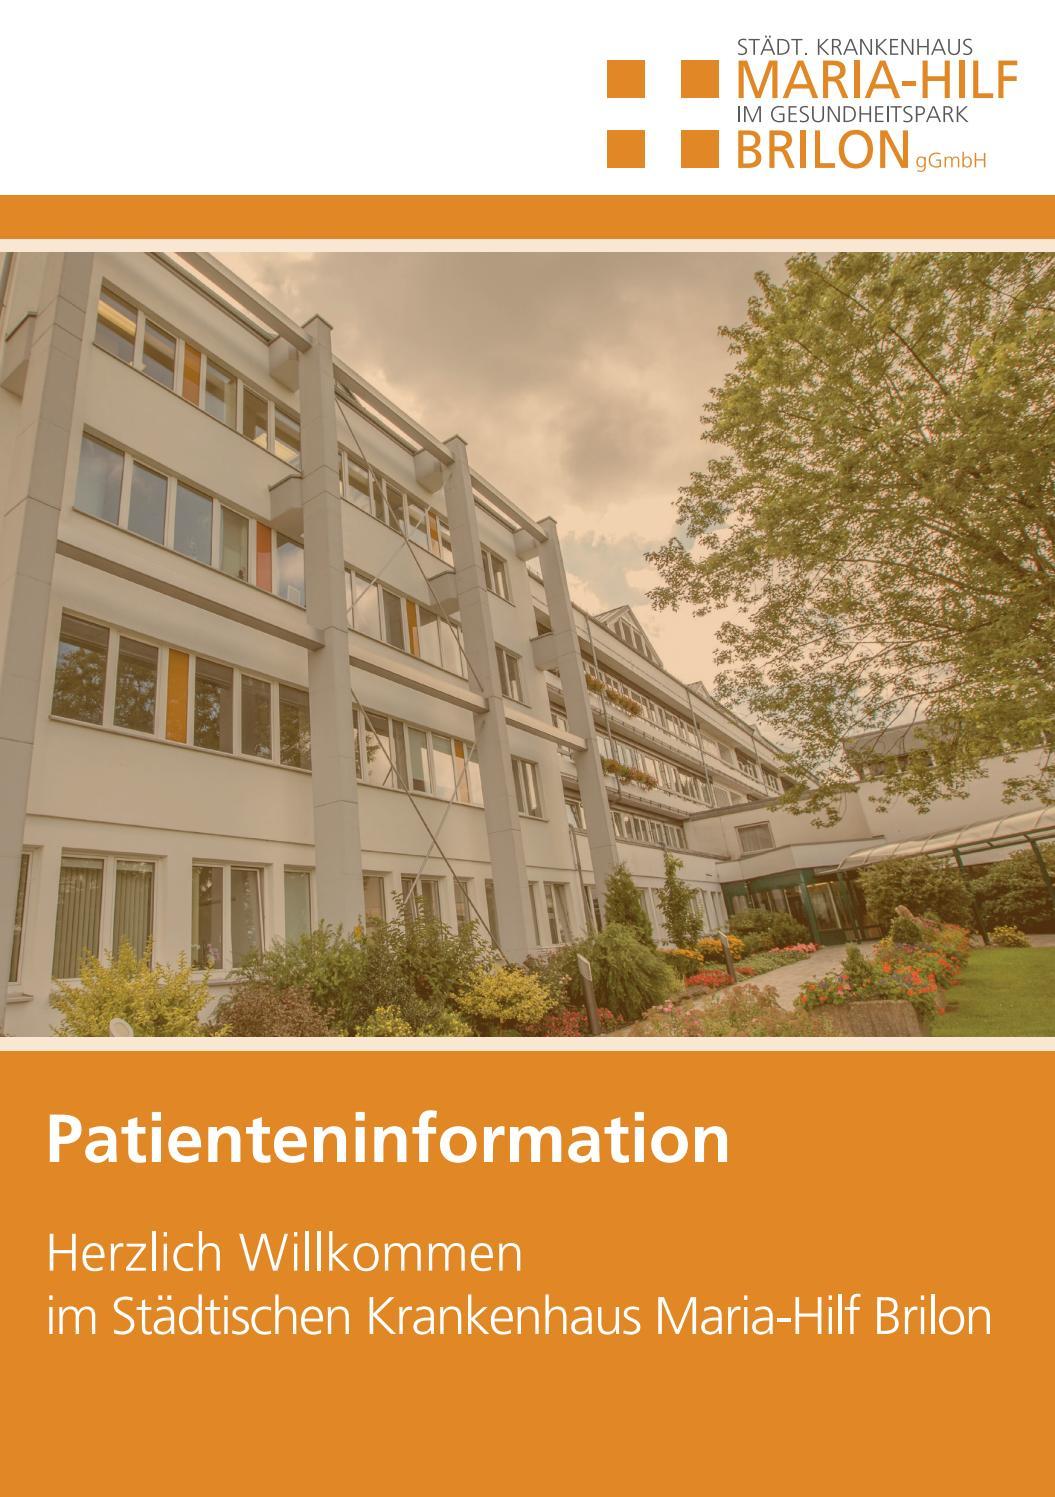 Patienteninformation final september 2017 by Brilon-totallokal - issuu